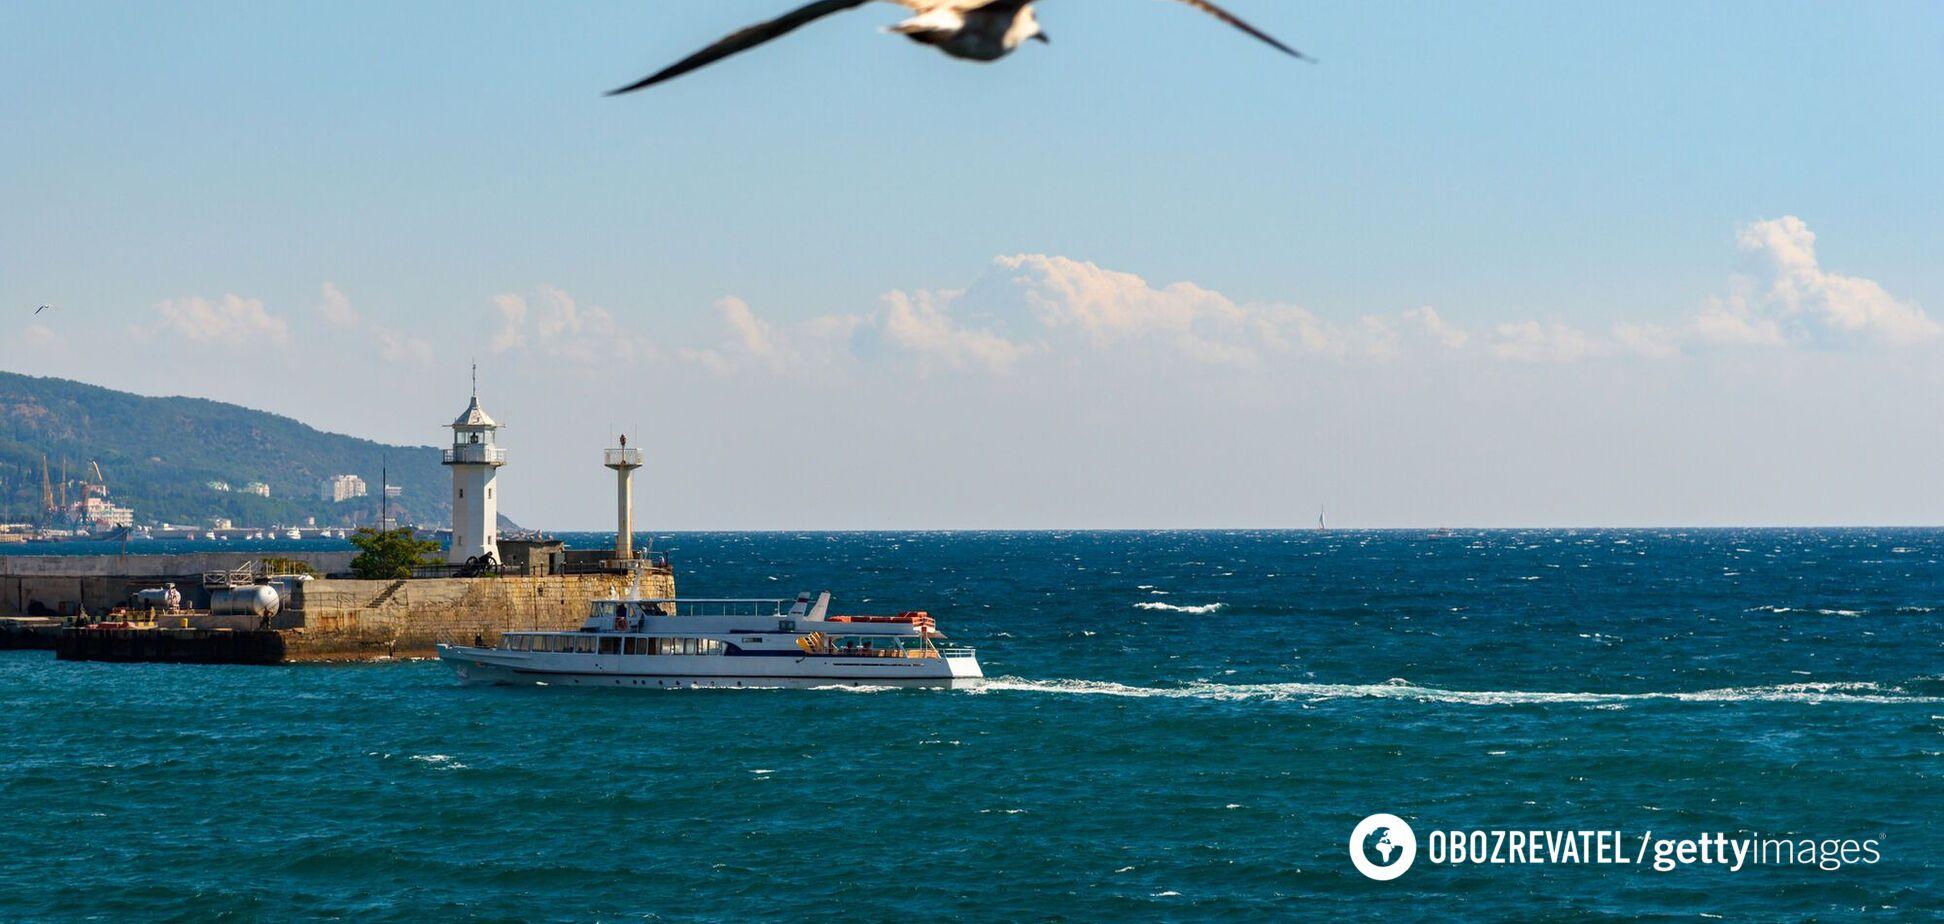 Обезвоживание Крыма: признаки обнищания населения